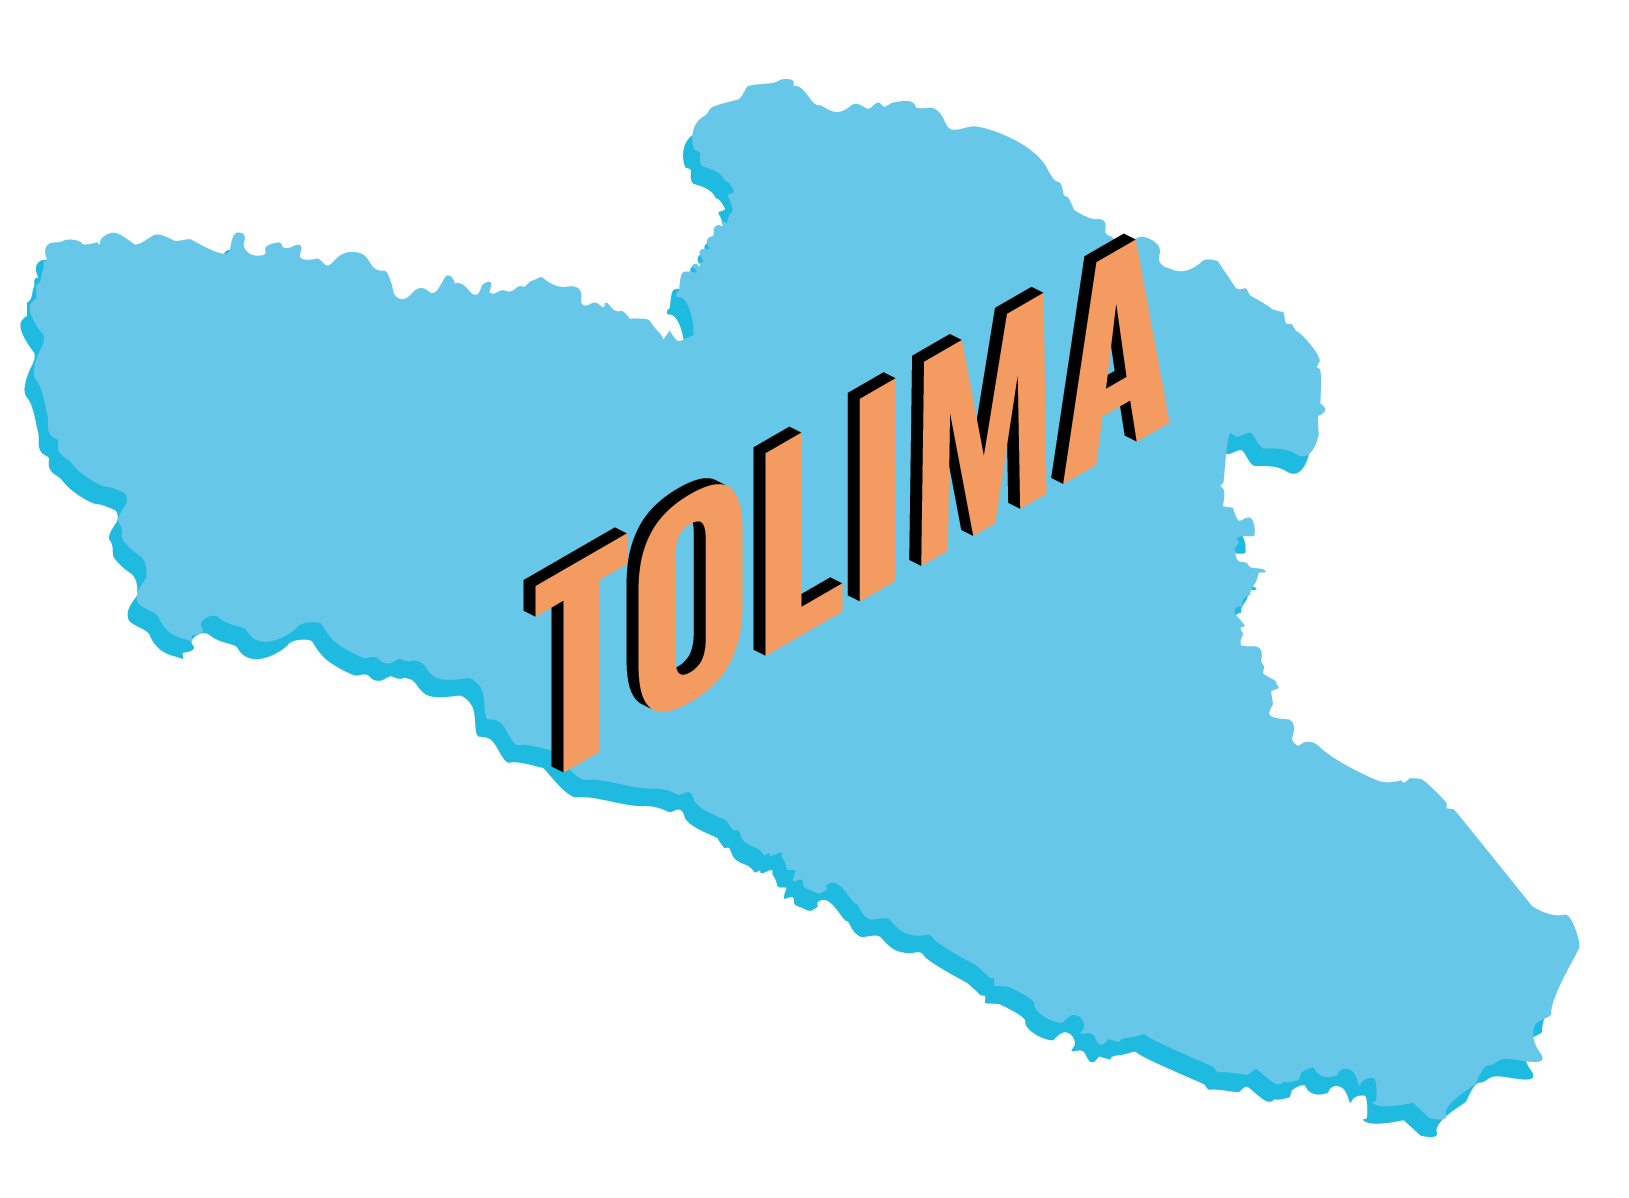 Tolima | LB Technology